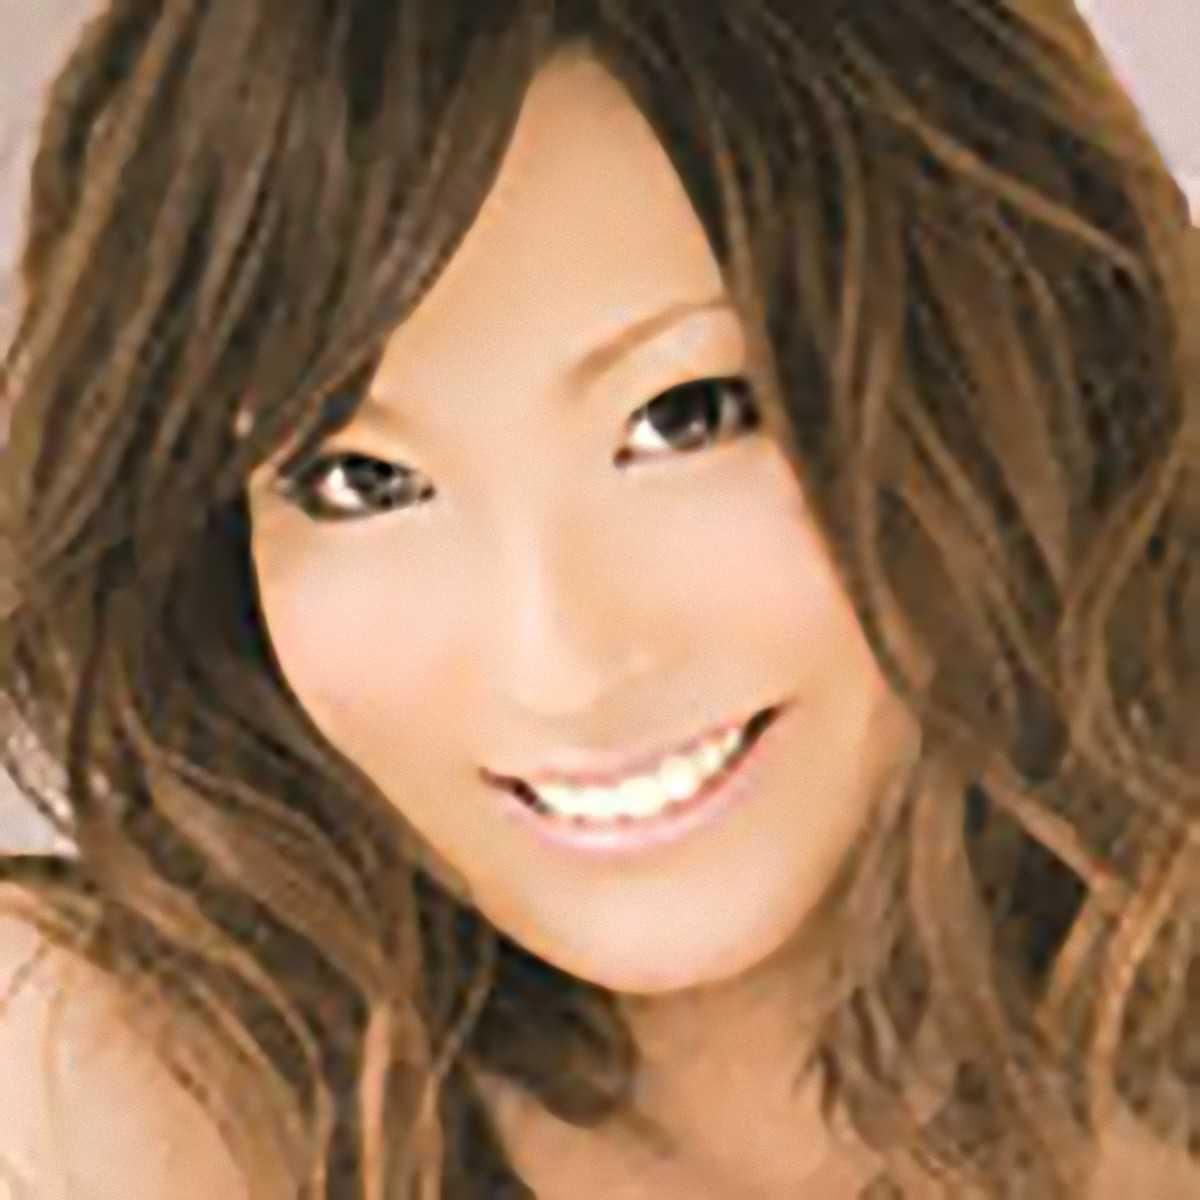 【AV】水野愛 : うらうら動画